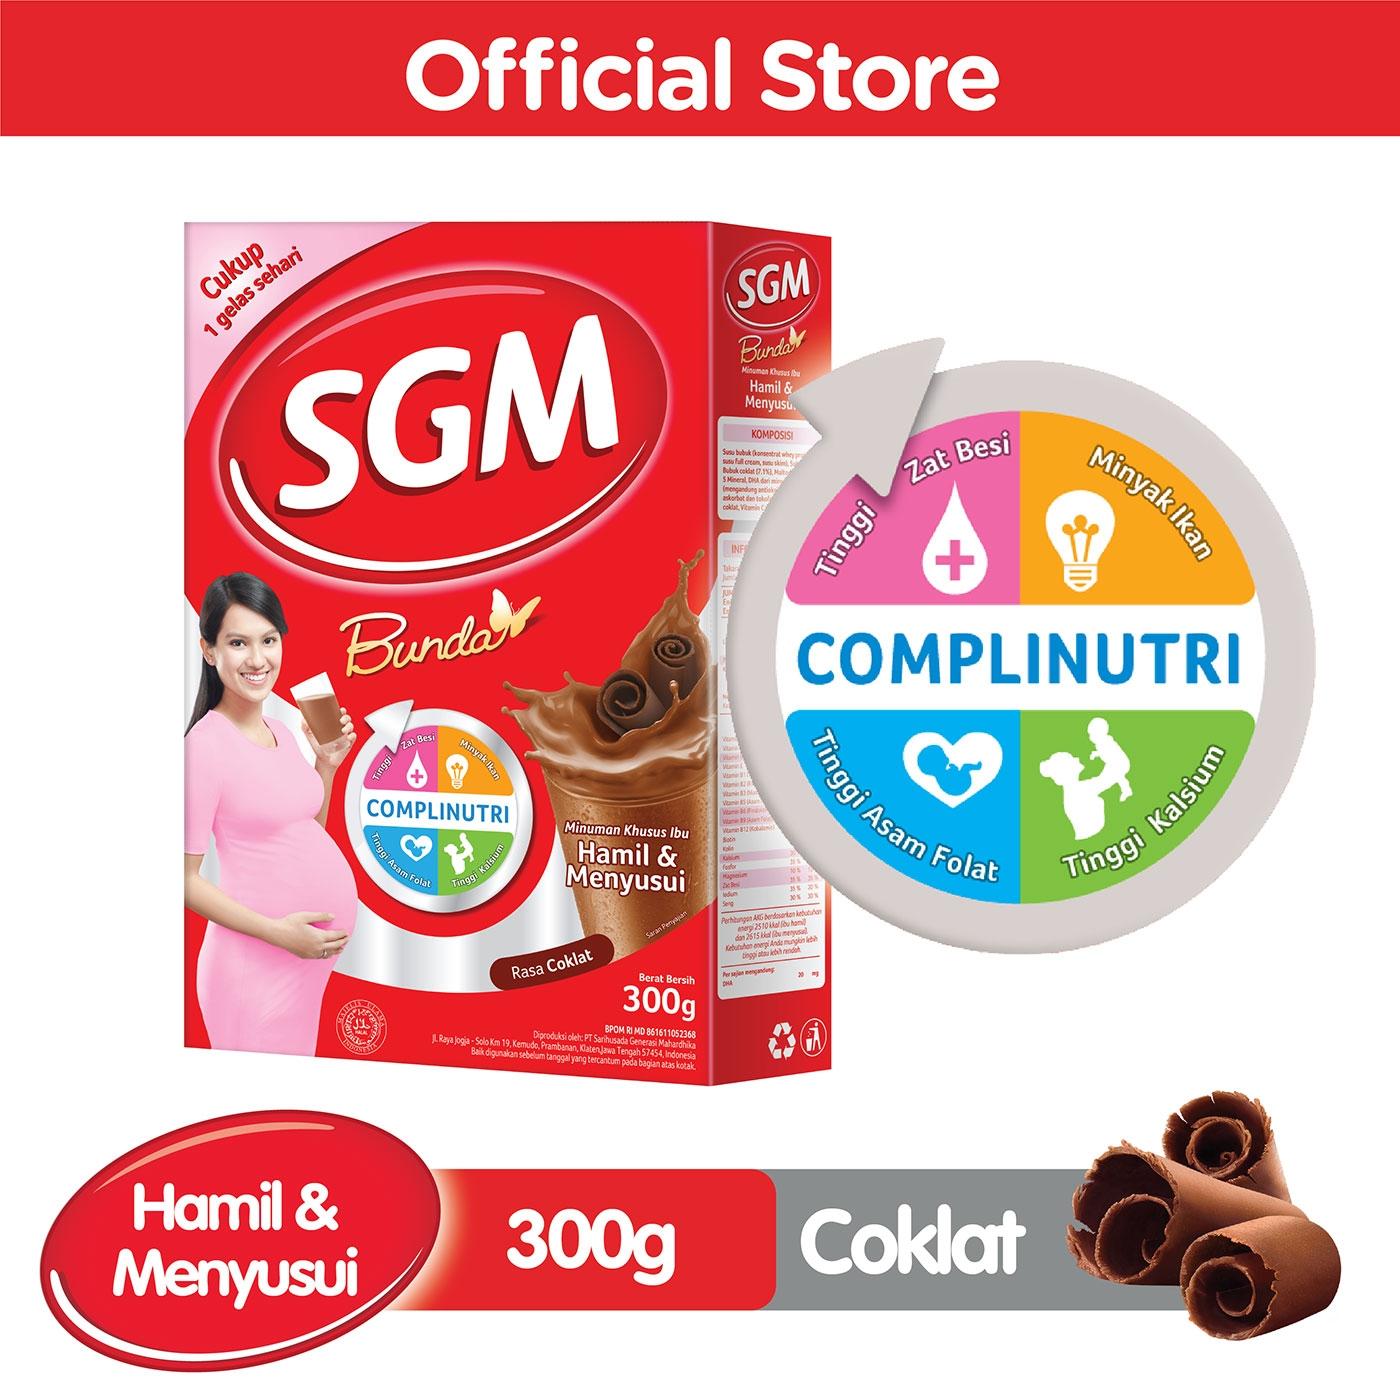 SGM Bunda Complinutri Cokelat Susu Bubuk Khusus Ibu Hamil & Menyusui 300 GR